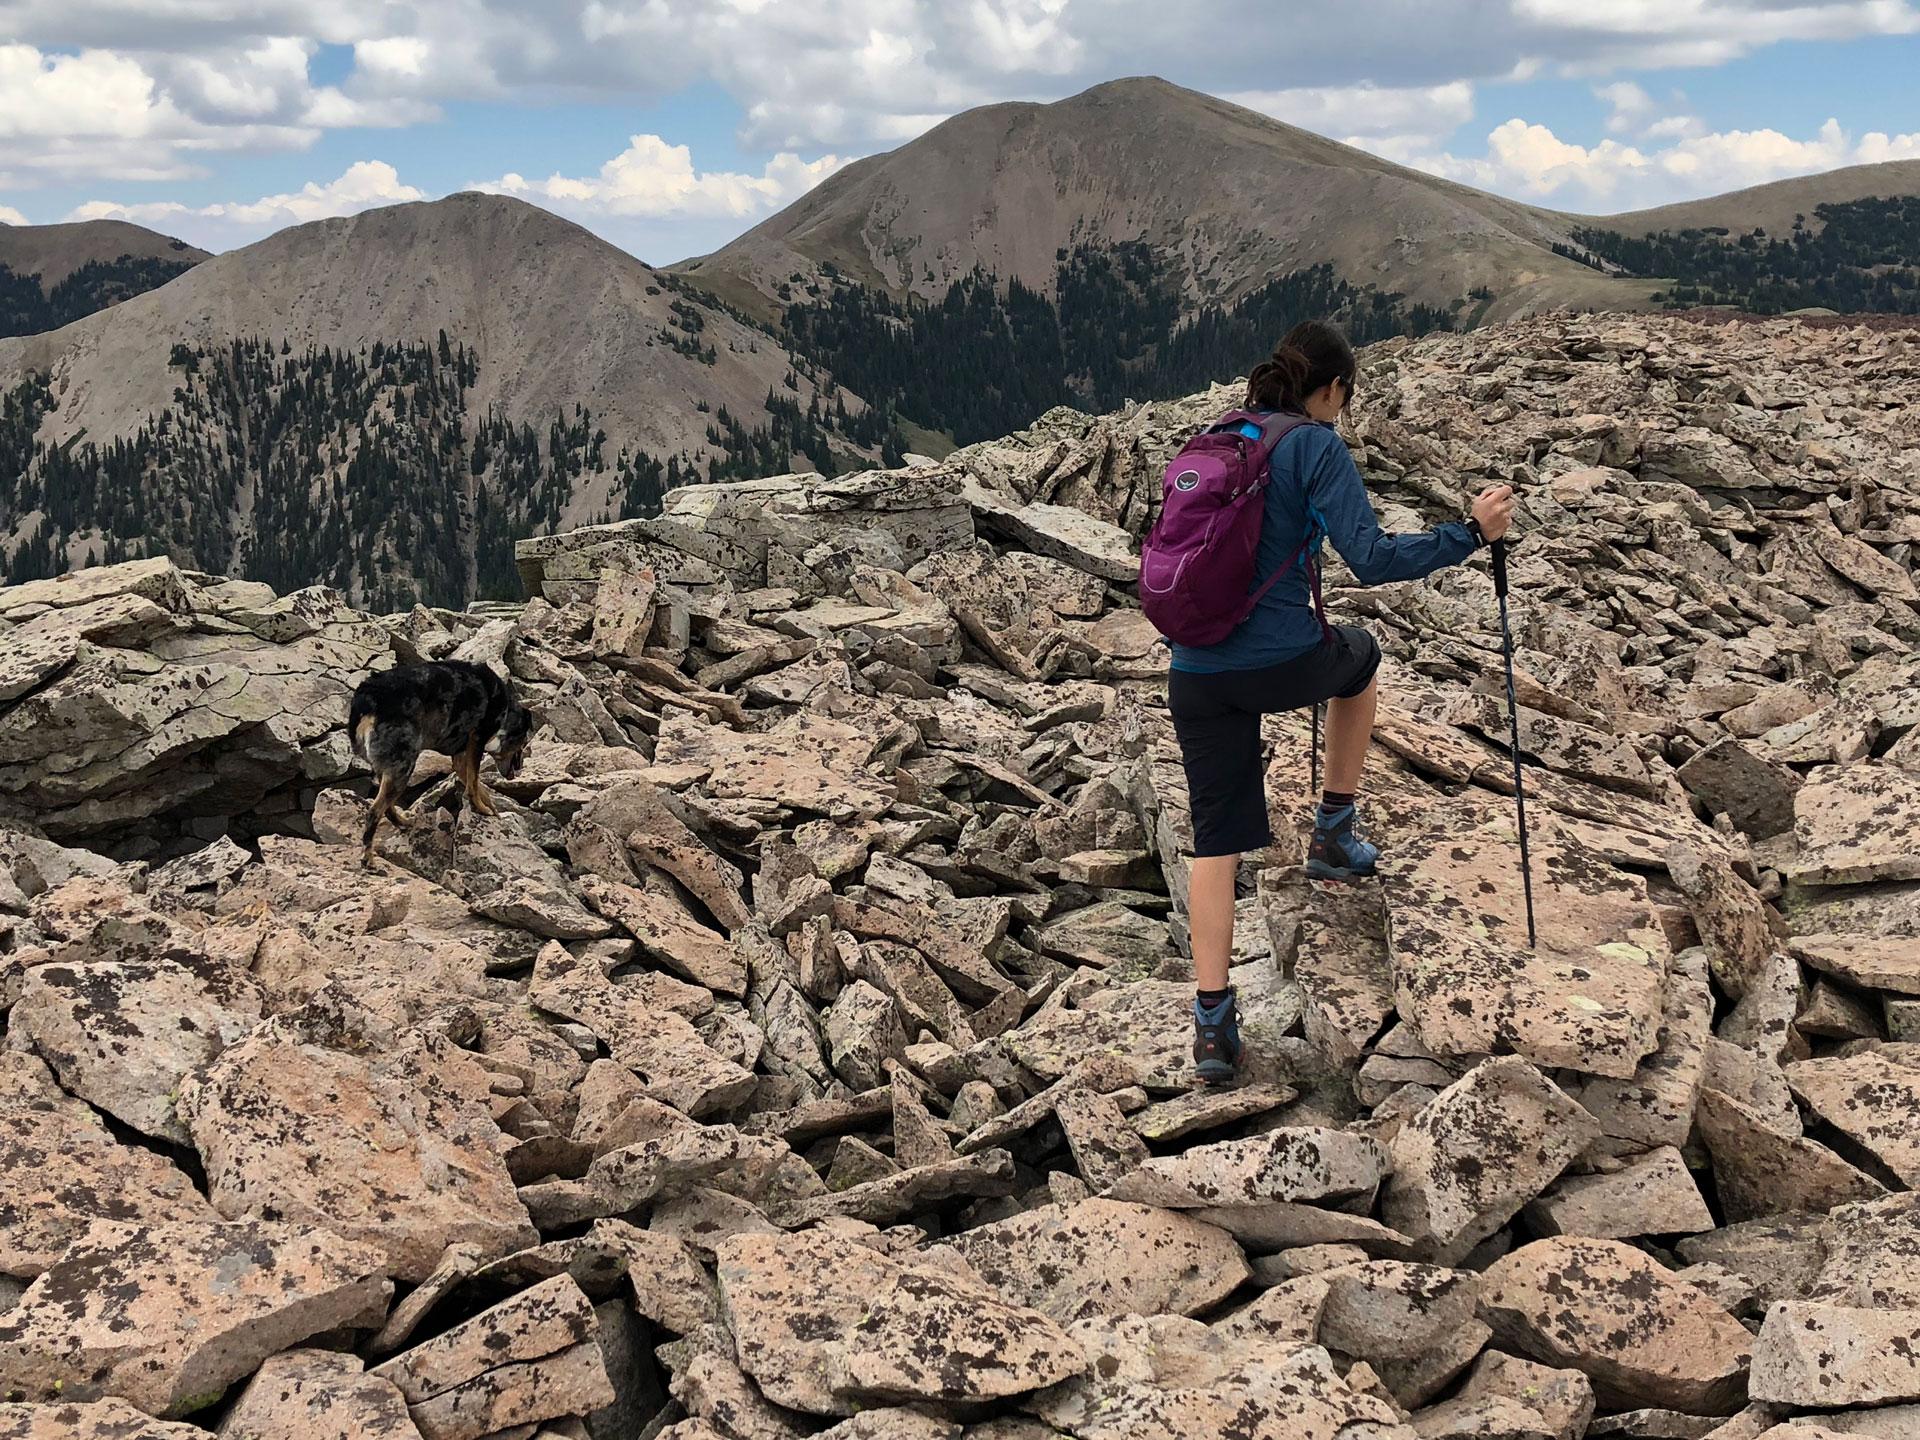 Steph Davis | 3 Training Tips for Climbers